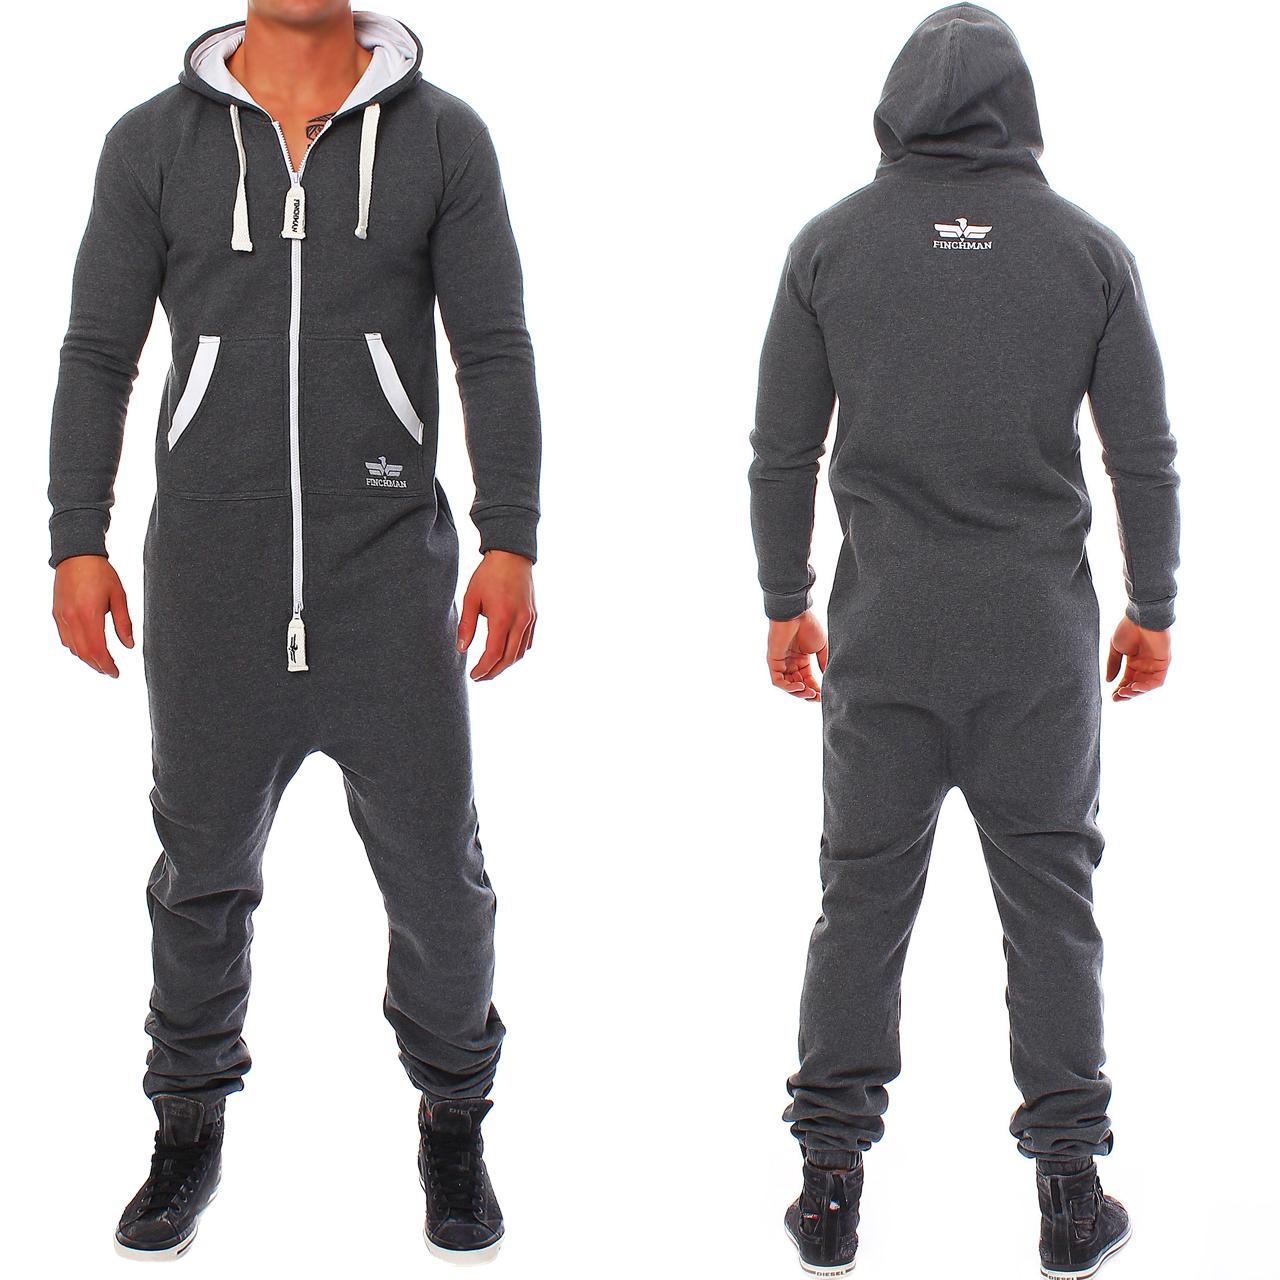 finchman herren jumpsuit jogger jogging anzug trainingsanzug overall onesie ebay. Black Bedroom Furniture Sets. Home Design Ideas